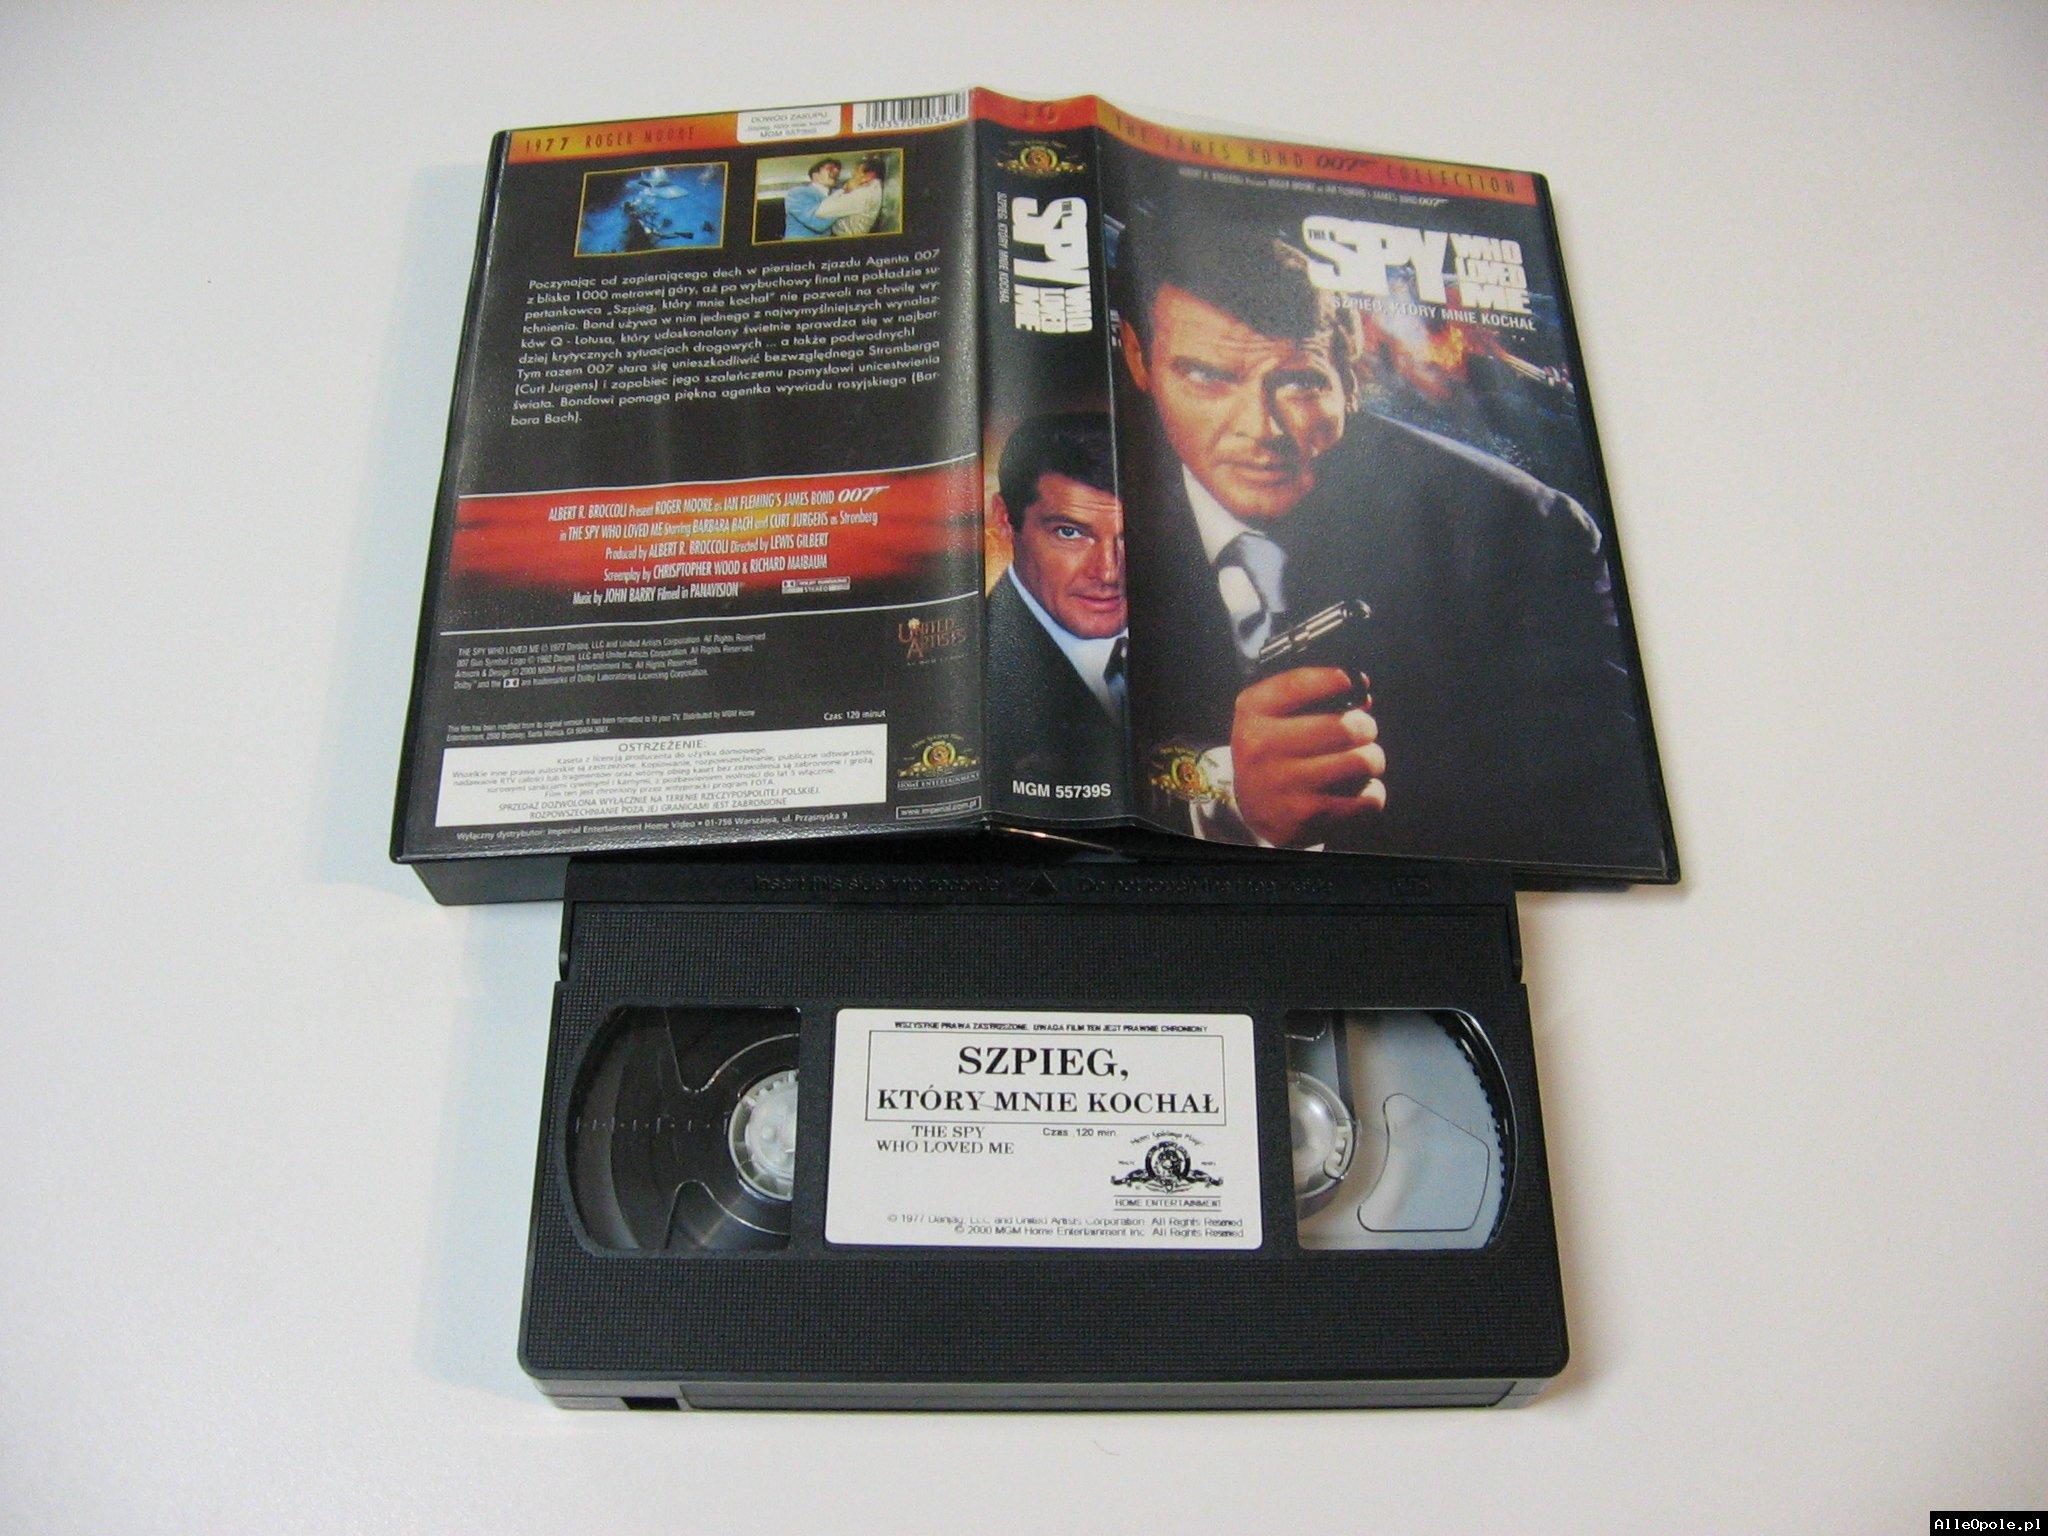 007 SZPIEG KTÓRY MNIE KOCHAŁ - VHS Kaseta Video - Opole 1734